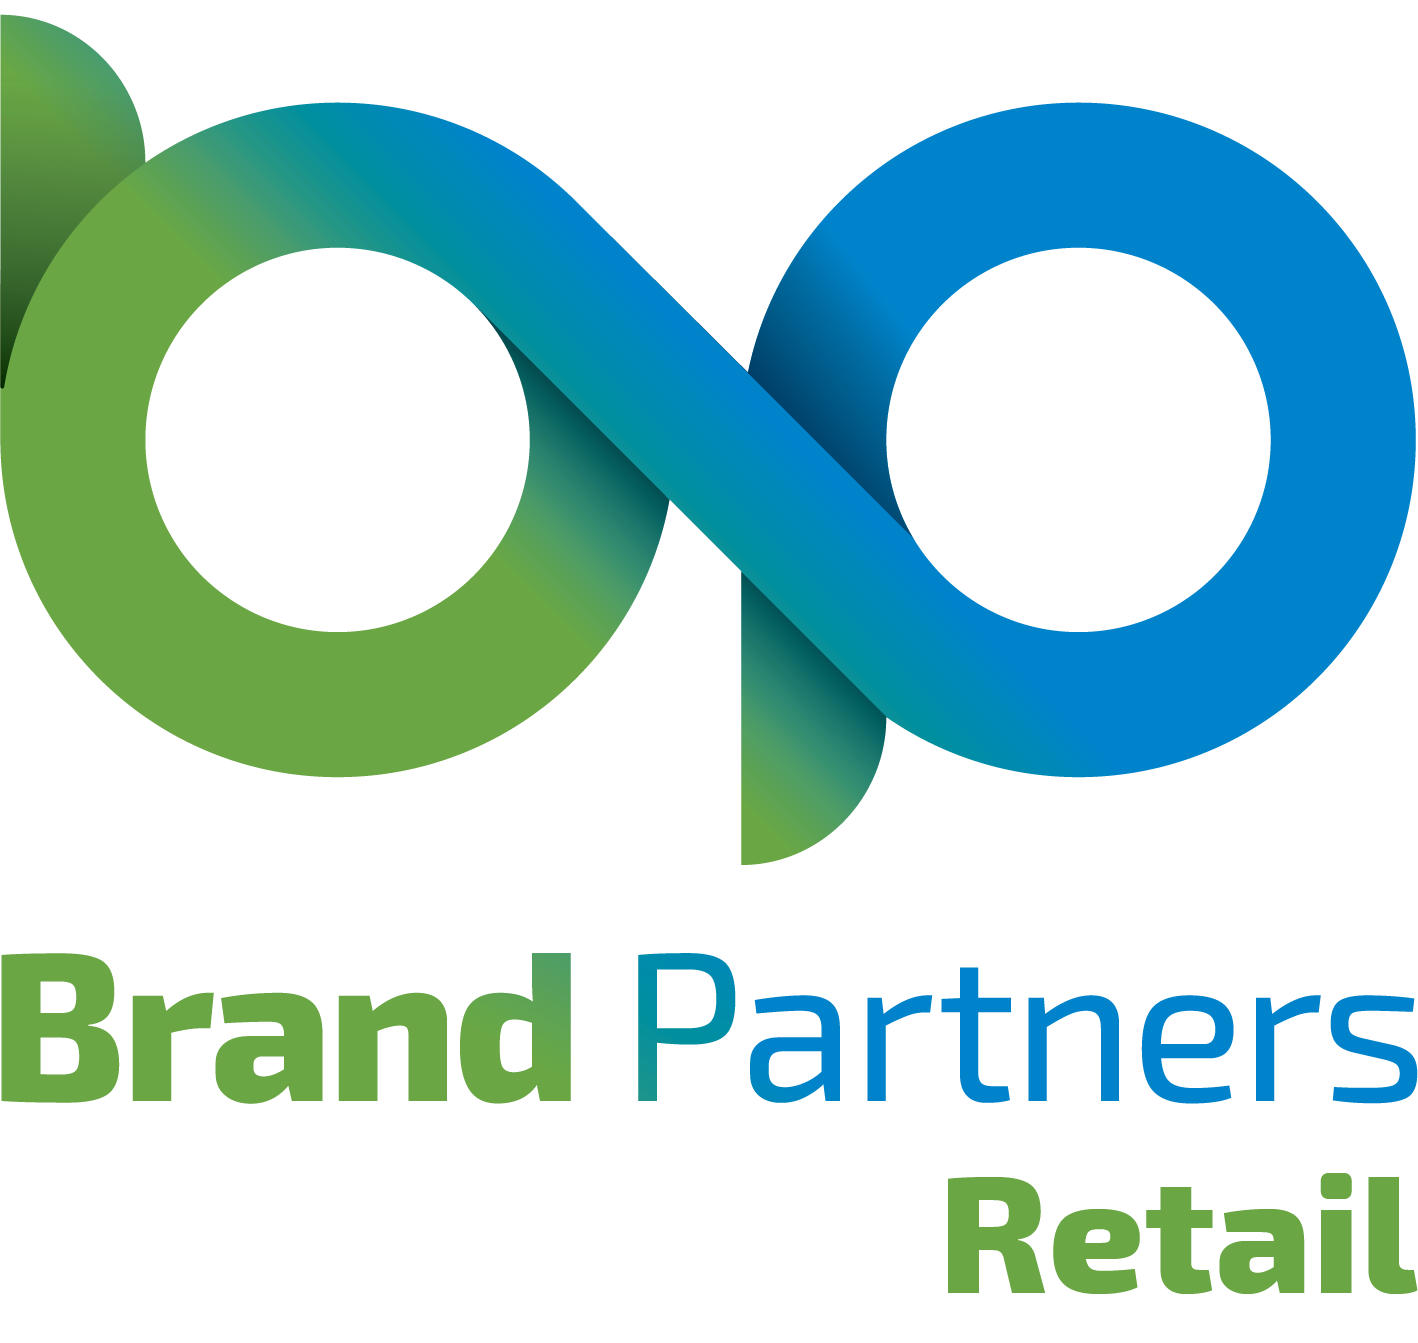 Brand Partners Retail